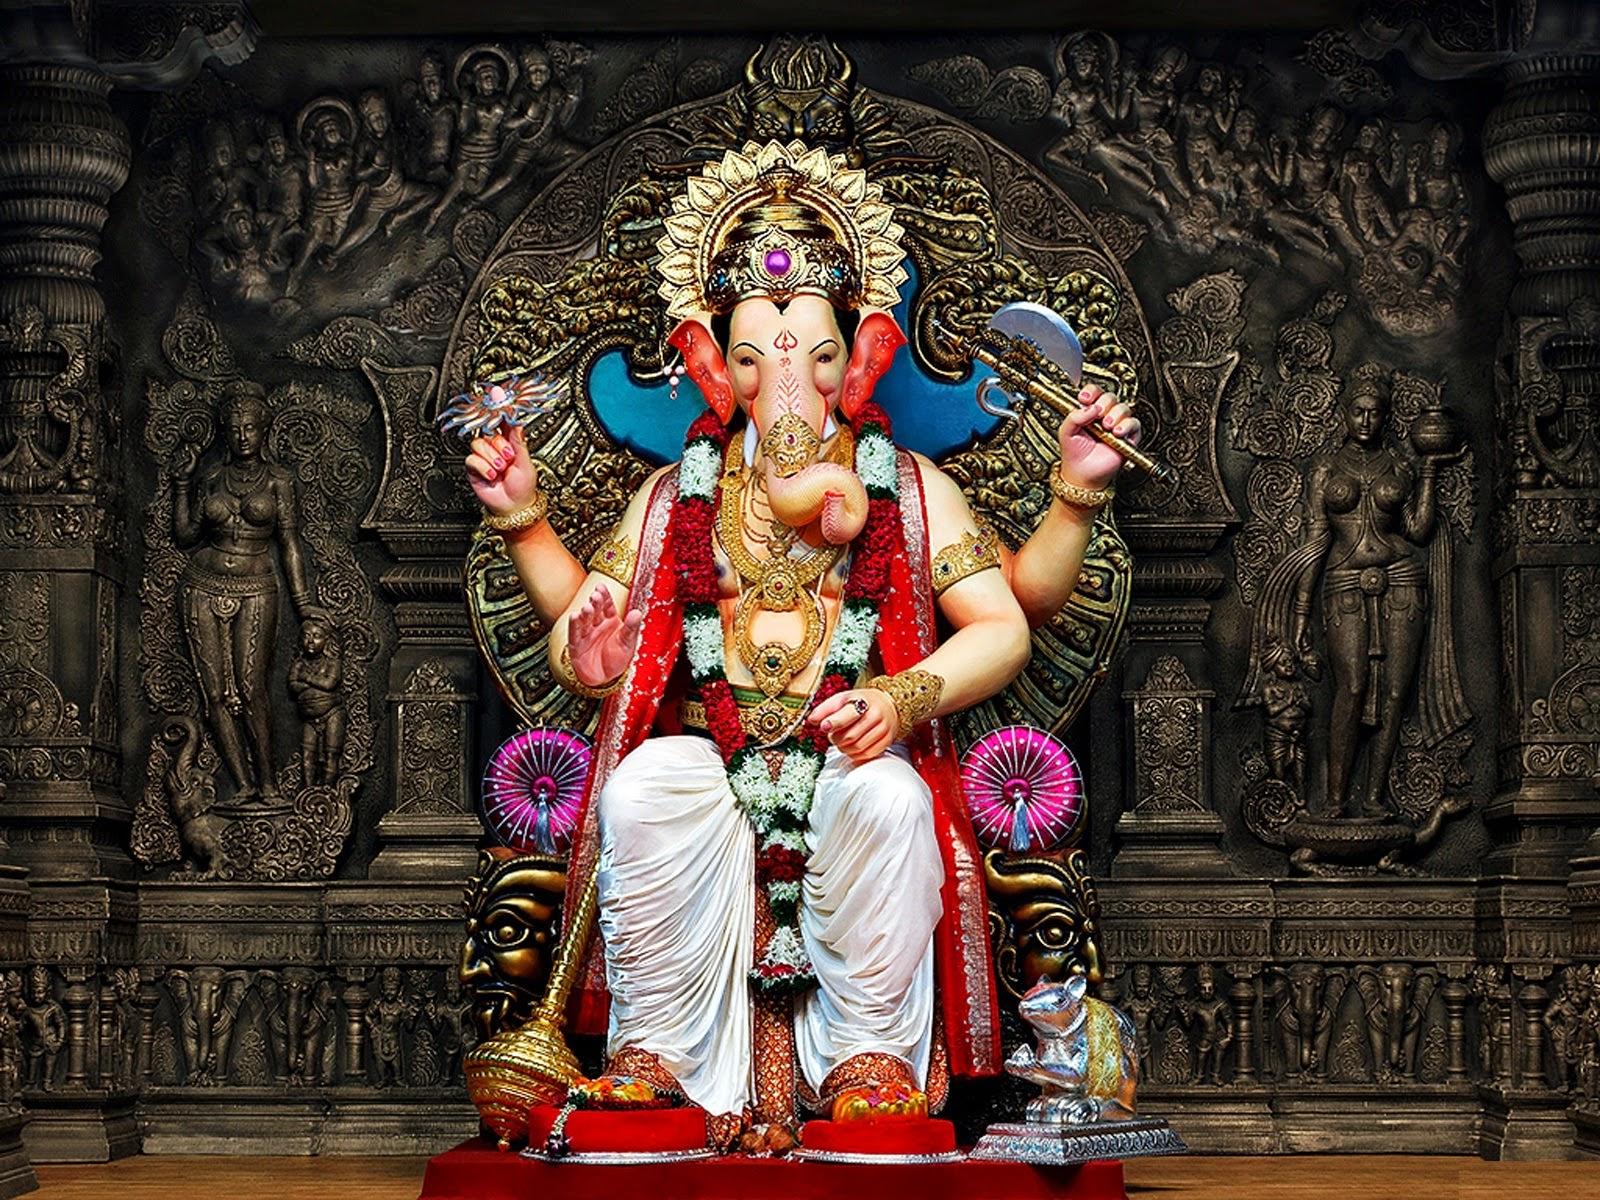 Ganpati images and wallpapers of ganesh murti for Decoration ka photo